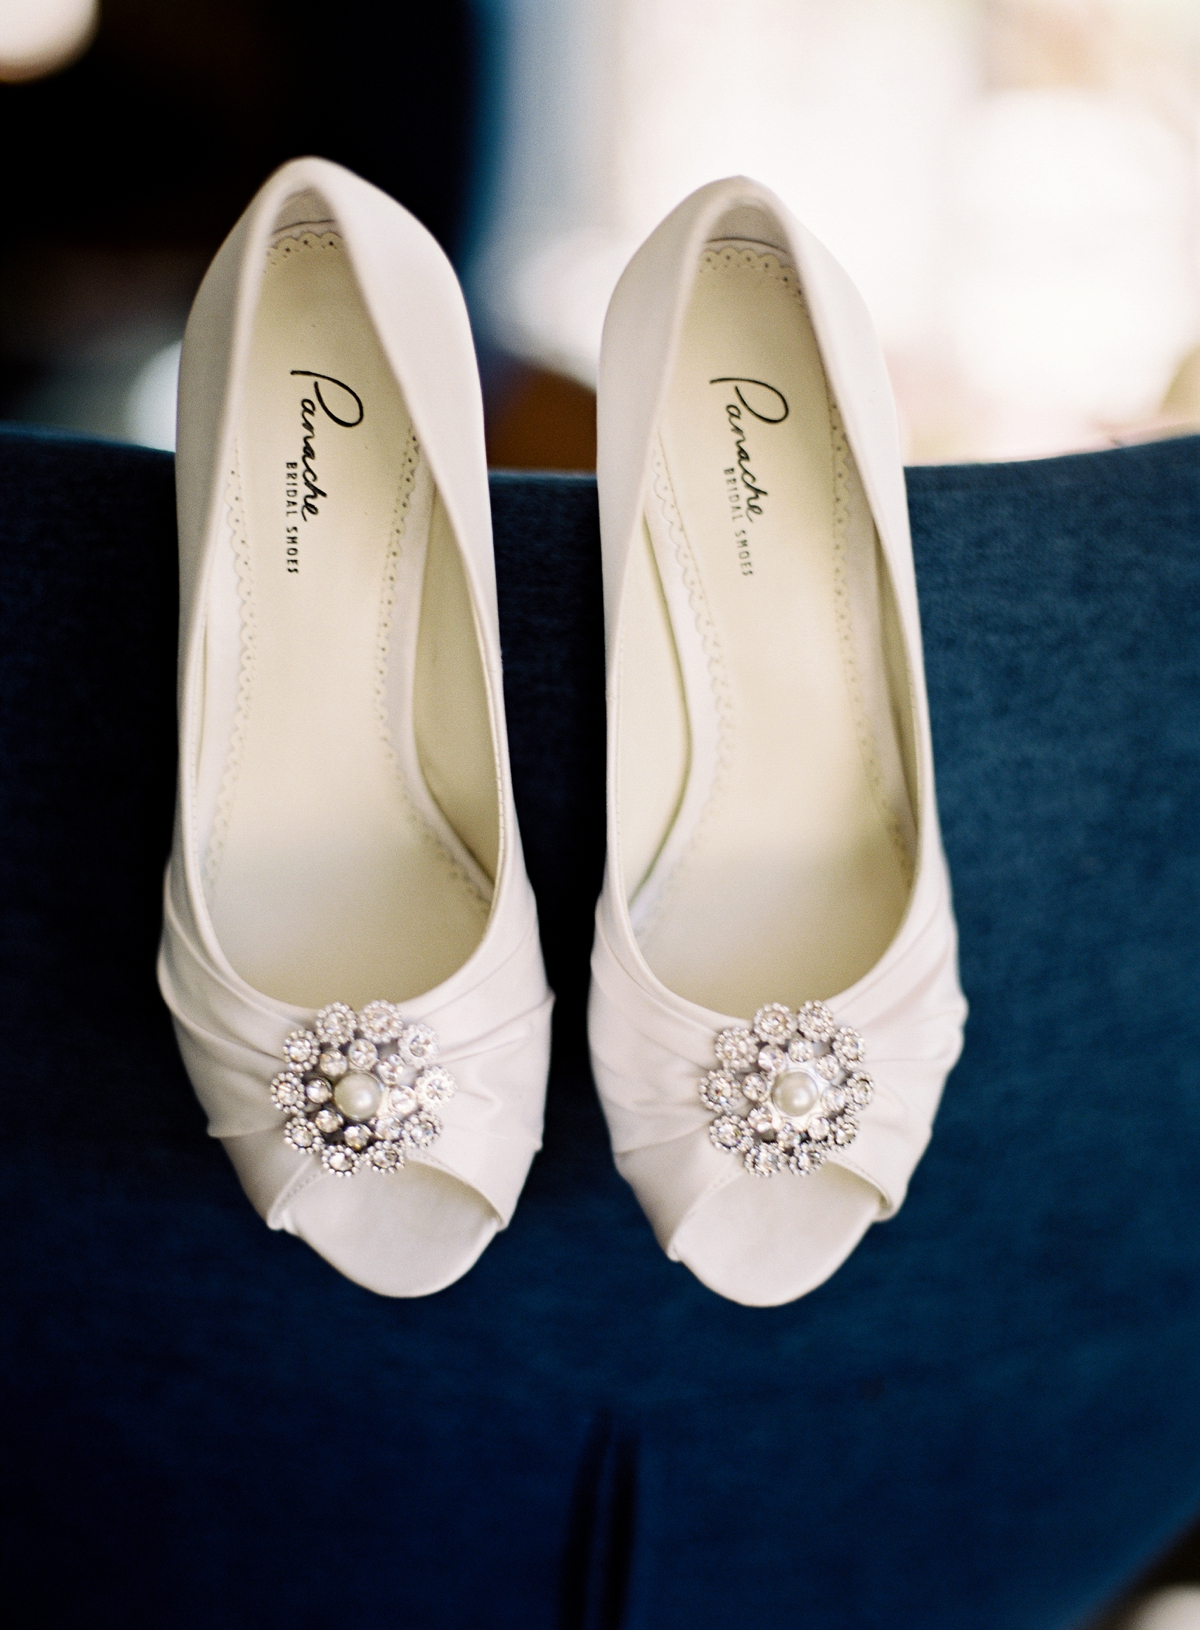 The Vine Grove Mudgee Wedding, Photography by Mr Edwards_1731.jpg